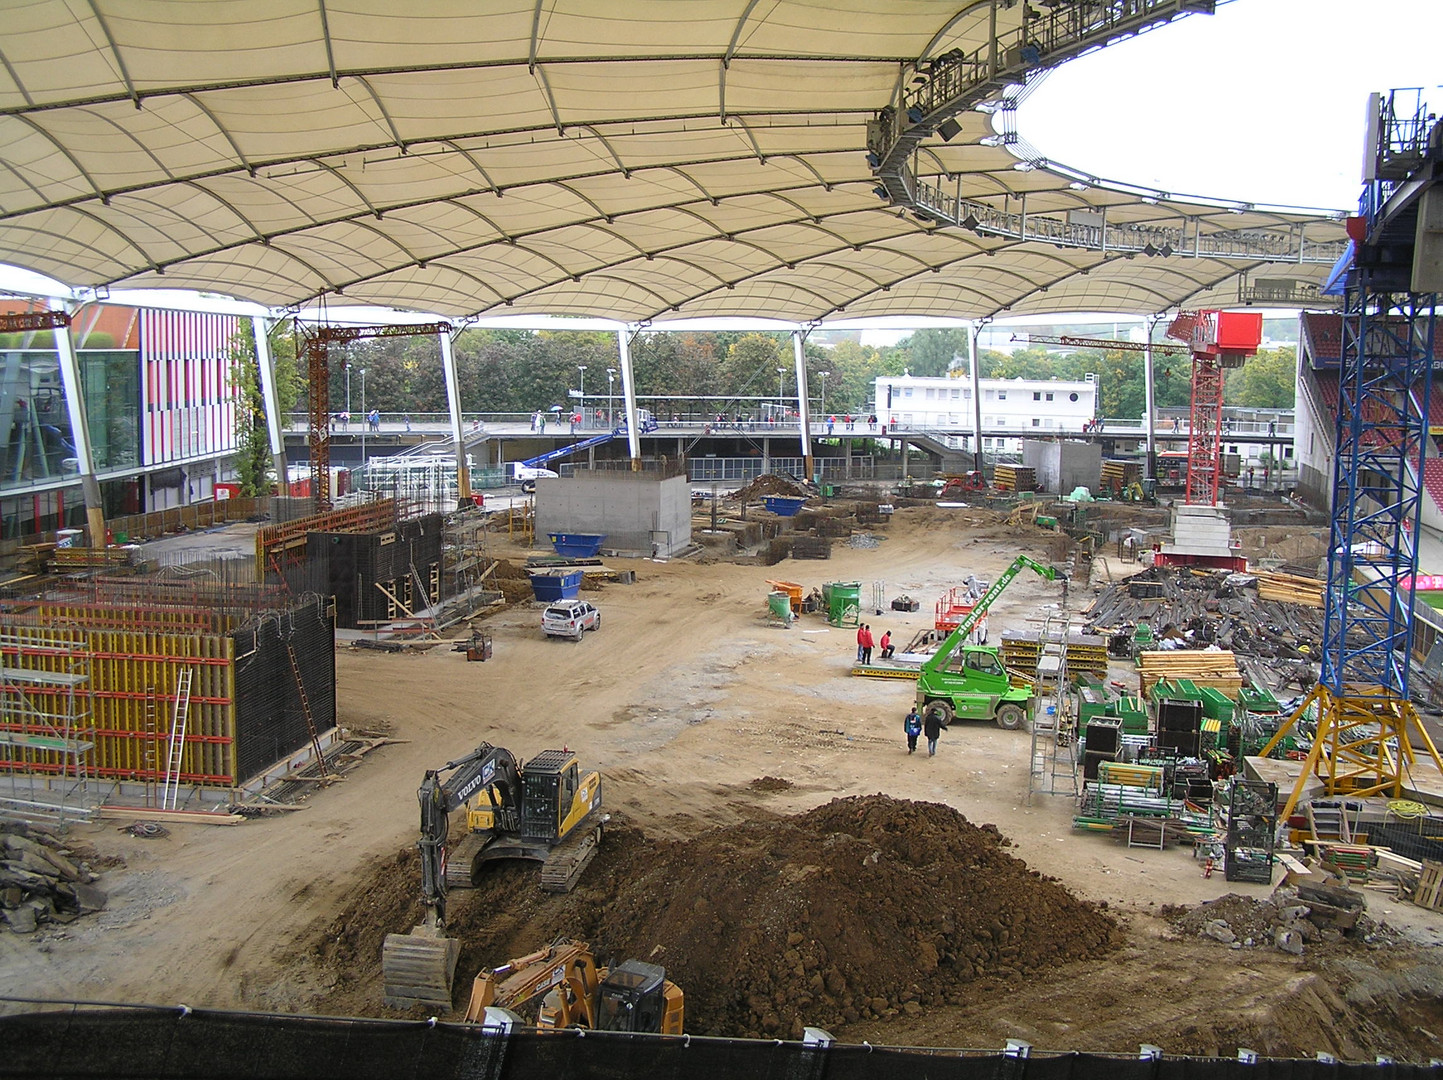 Baustelle Cannstatter Kurve (Mercedes-Benz-Arena - Stuttgart) 25.09.2010 -2-